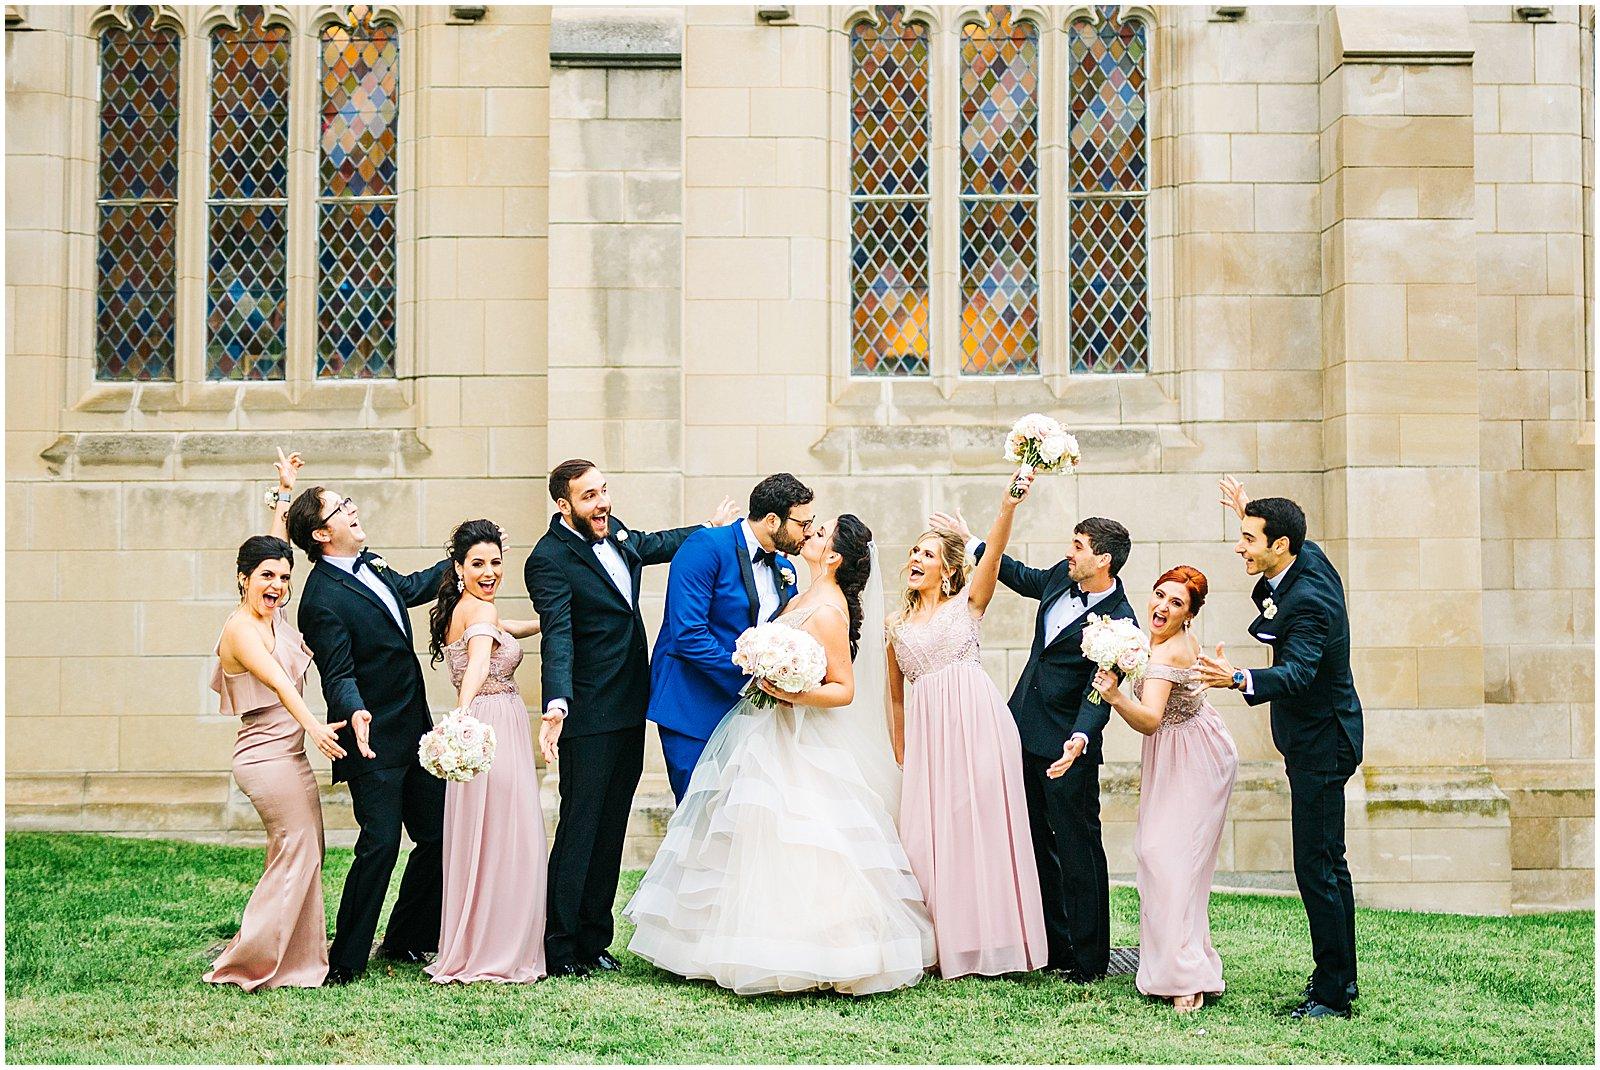 classic-elegant-greek-bethesda-washington-dc-washingtonian-wedding-photo_1721.jpg